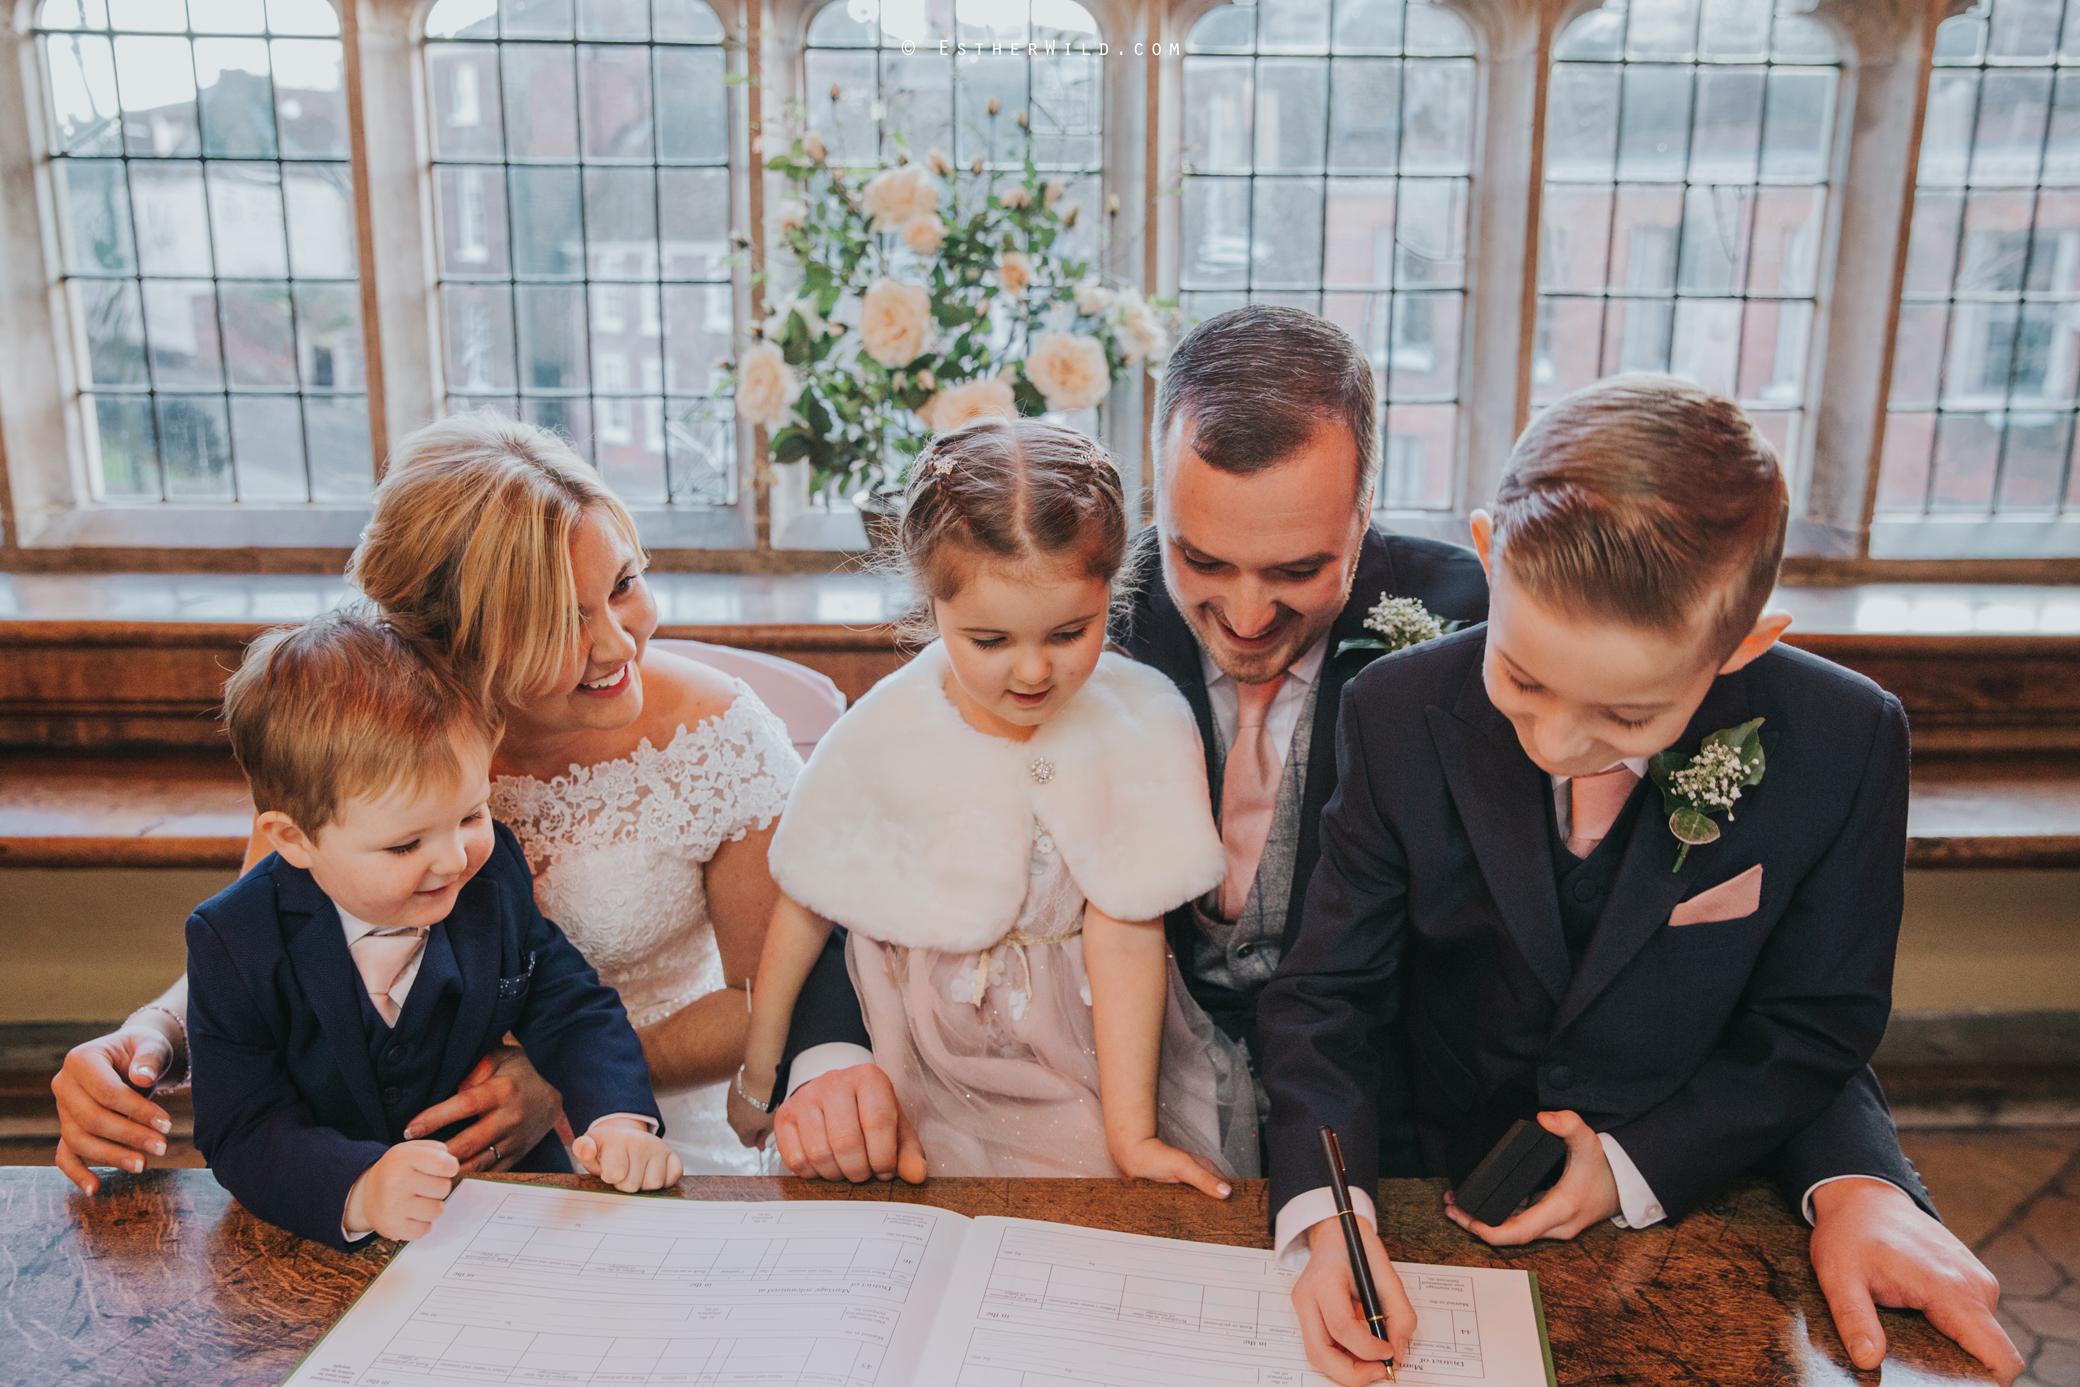 Wedding_Kings_Lynn_Town_Hall_Norfolk_Photographer_Esther_Wild_IMG_1107.jpg